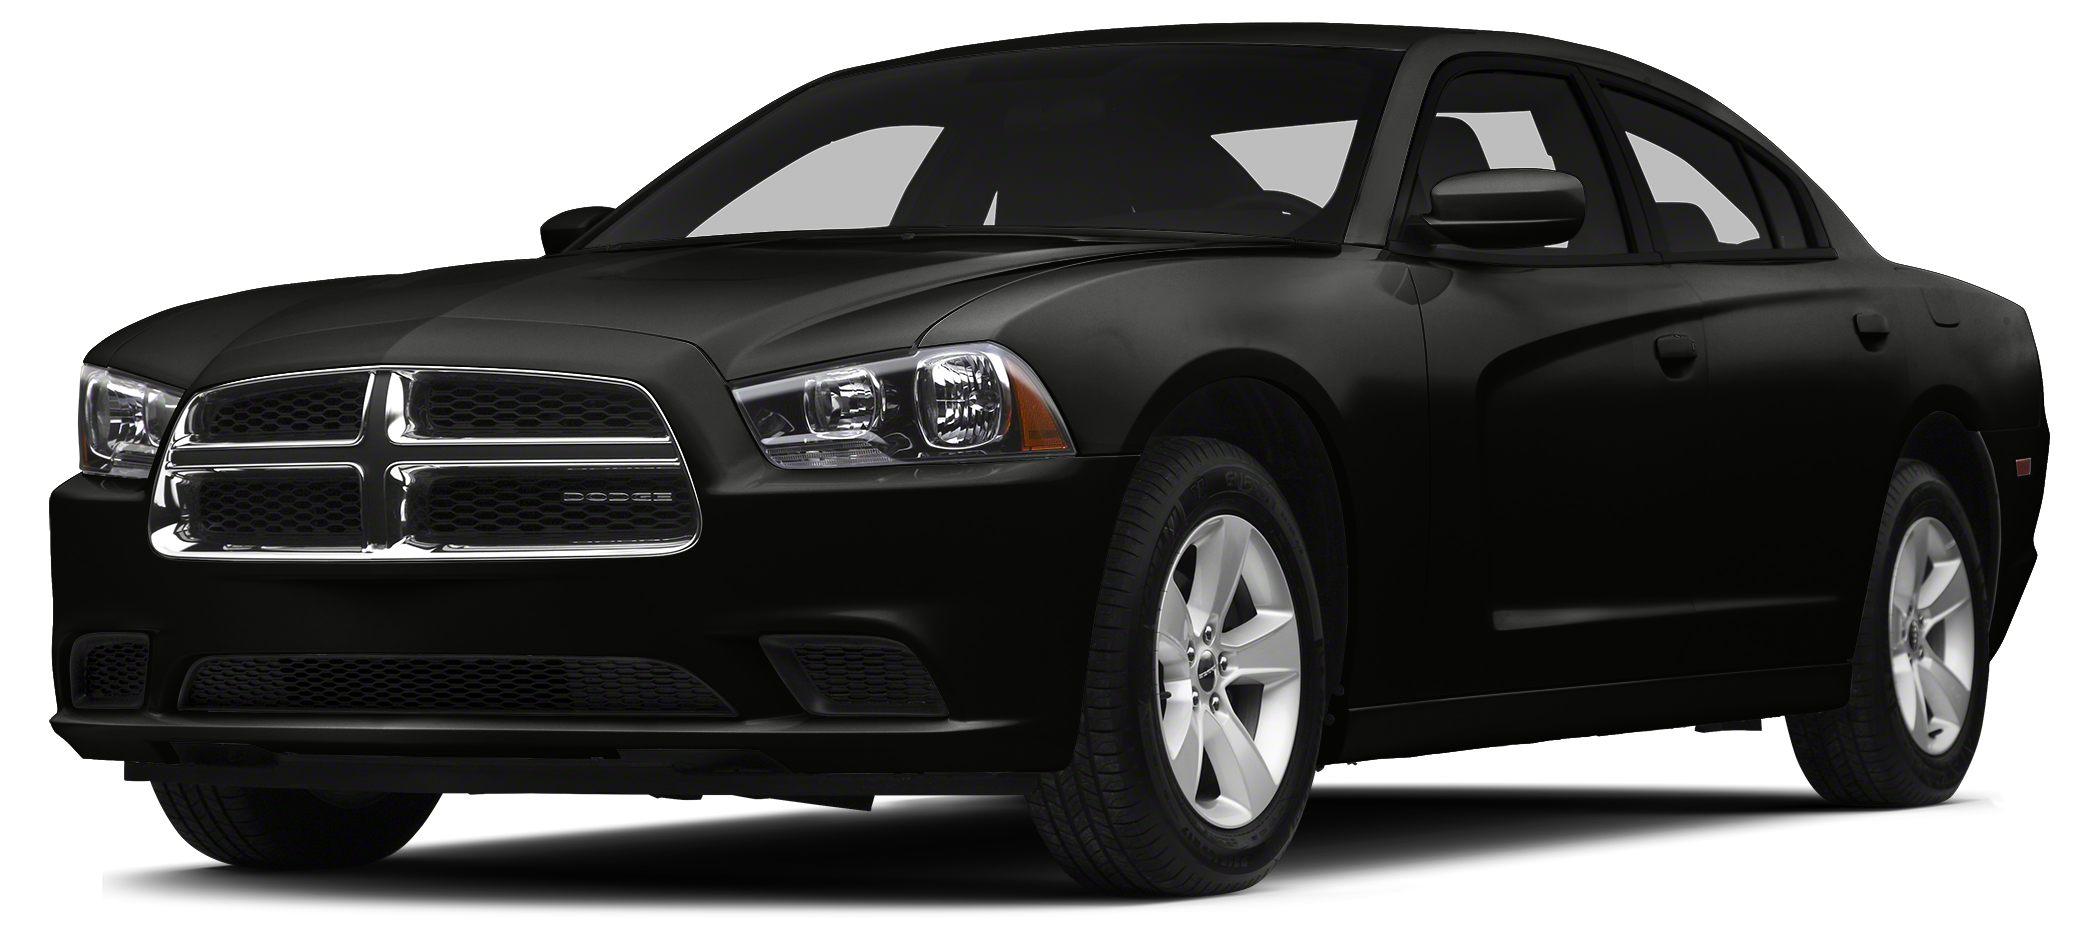 2014 Dodge Charger SXT SXT trim LOW MILES - 12288 Heated Seats Bluetooth iPodMP3 Input Dual